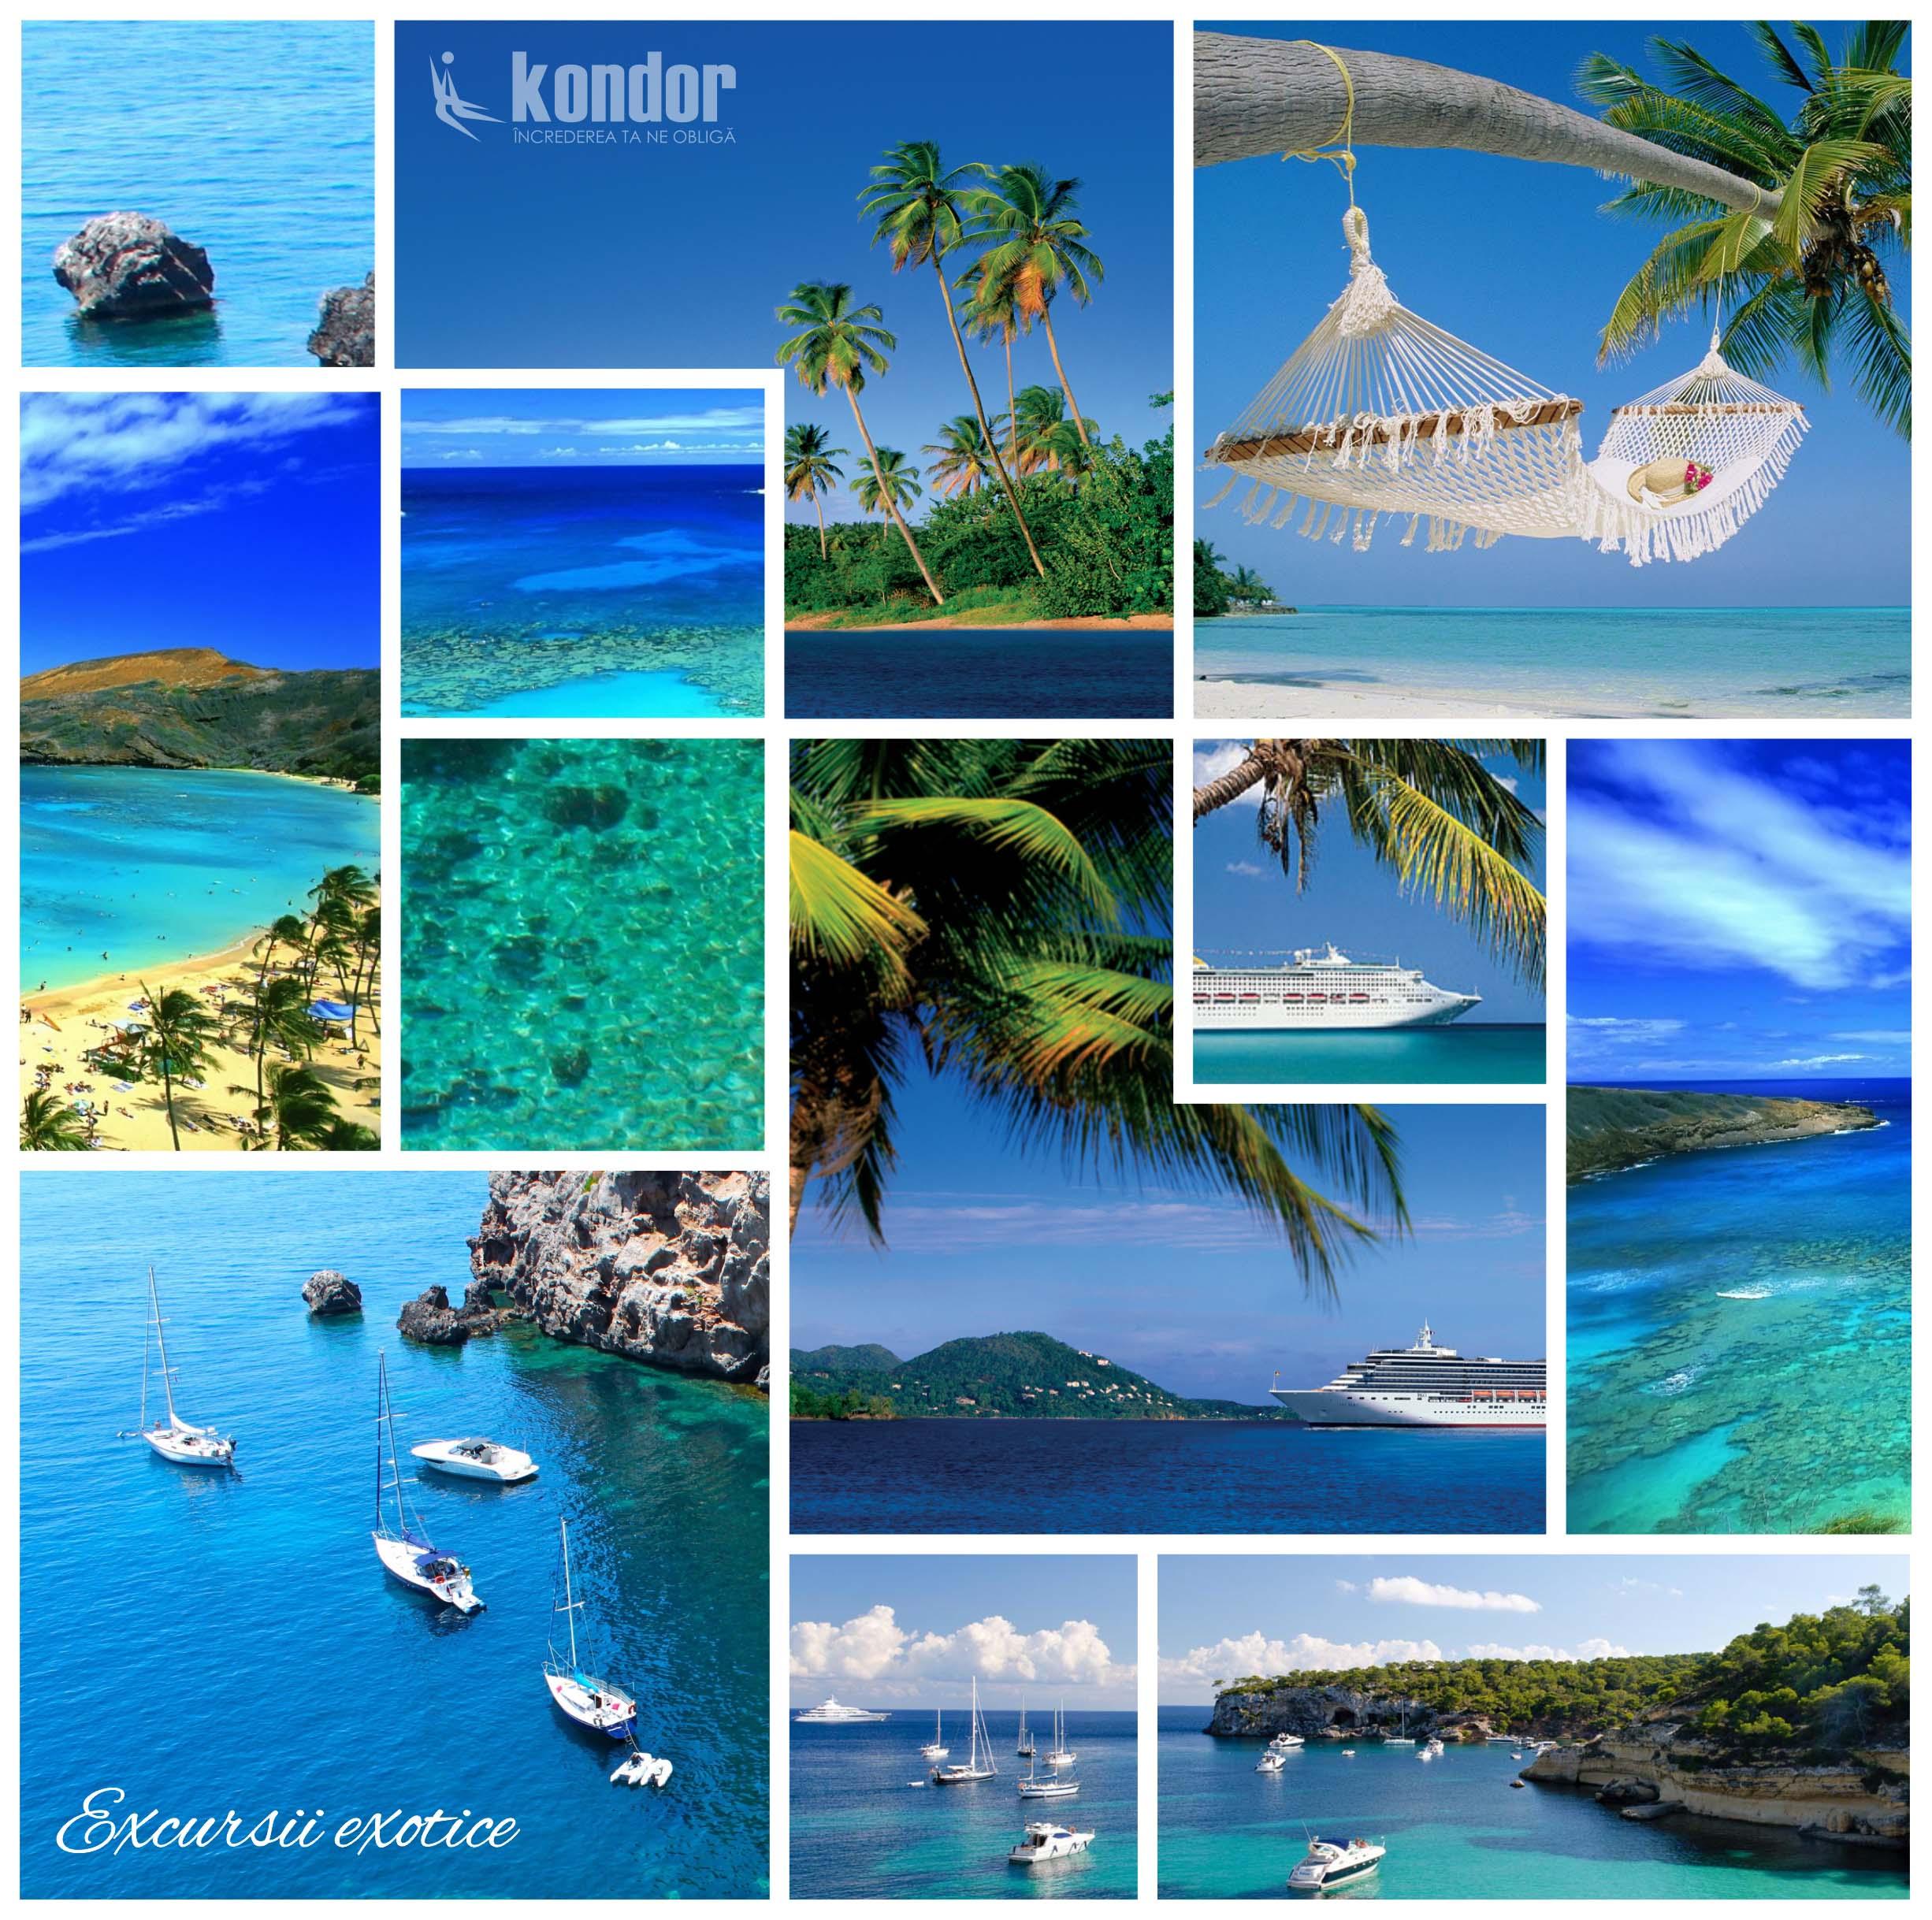 Excursii exotice - Premii Kondor